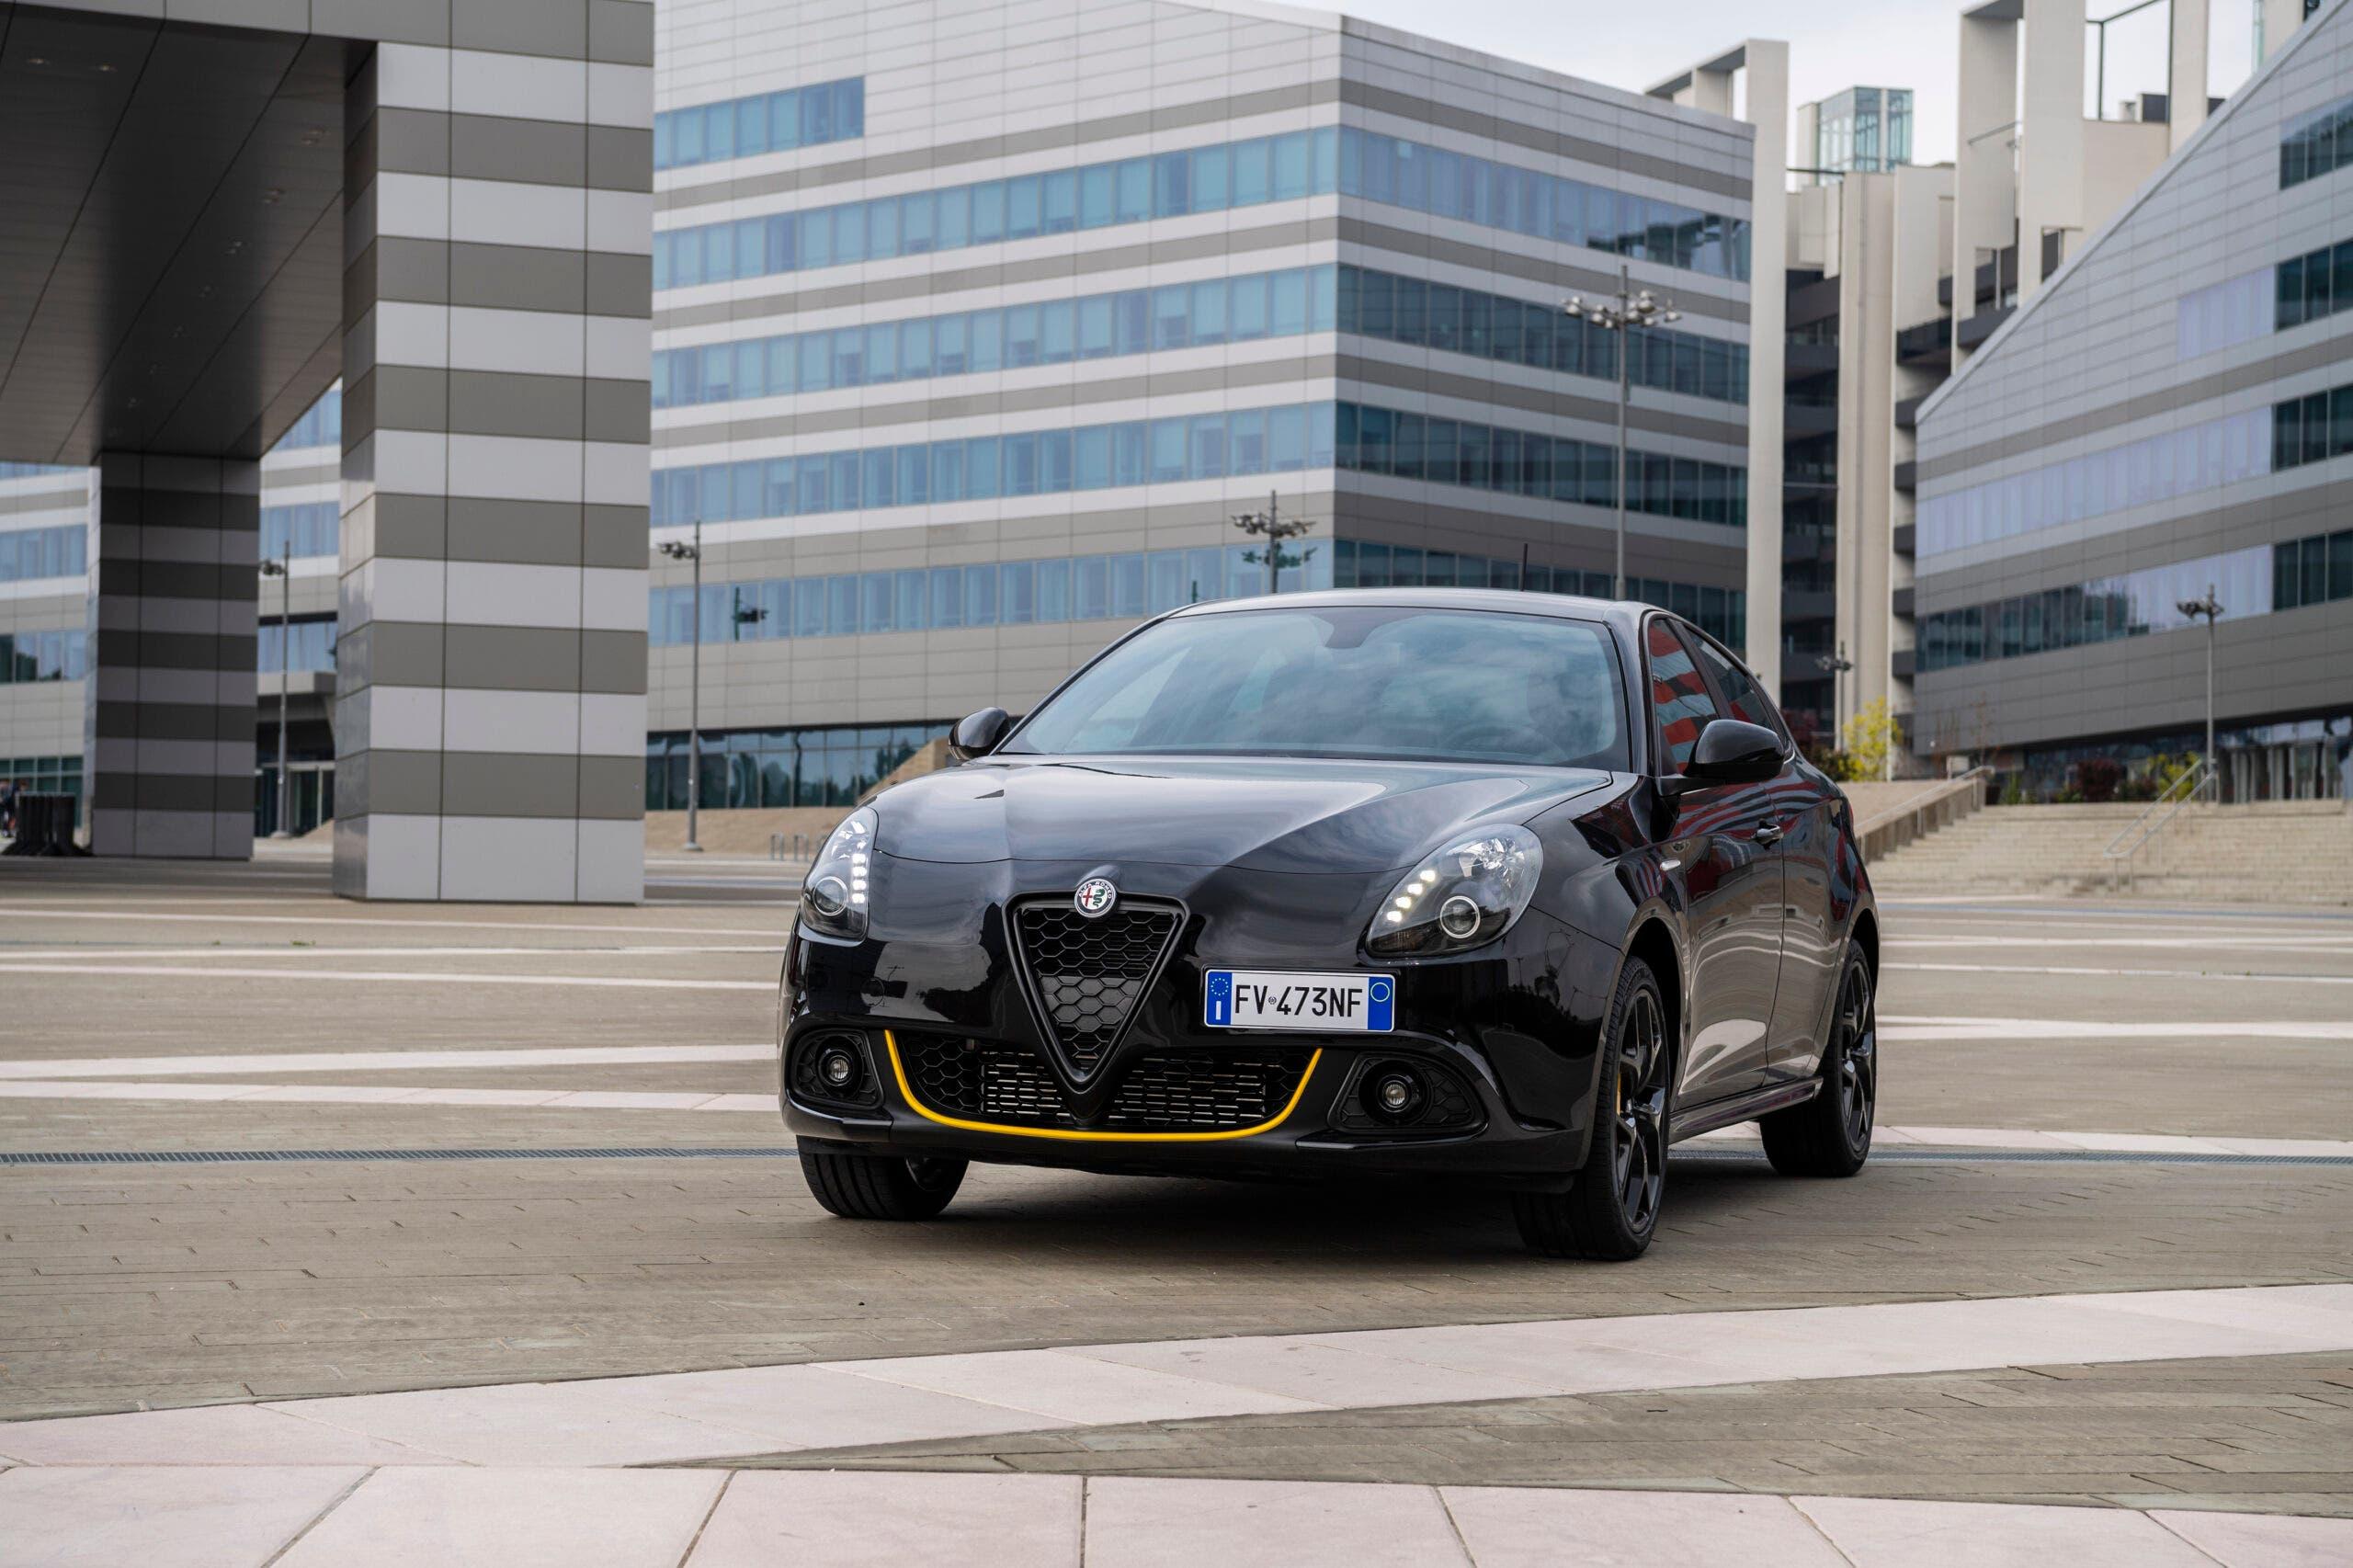 Alfa Romeo Giulietta my 2020